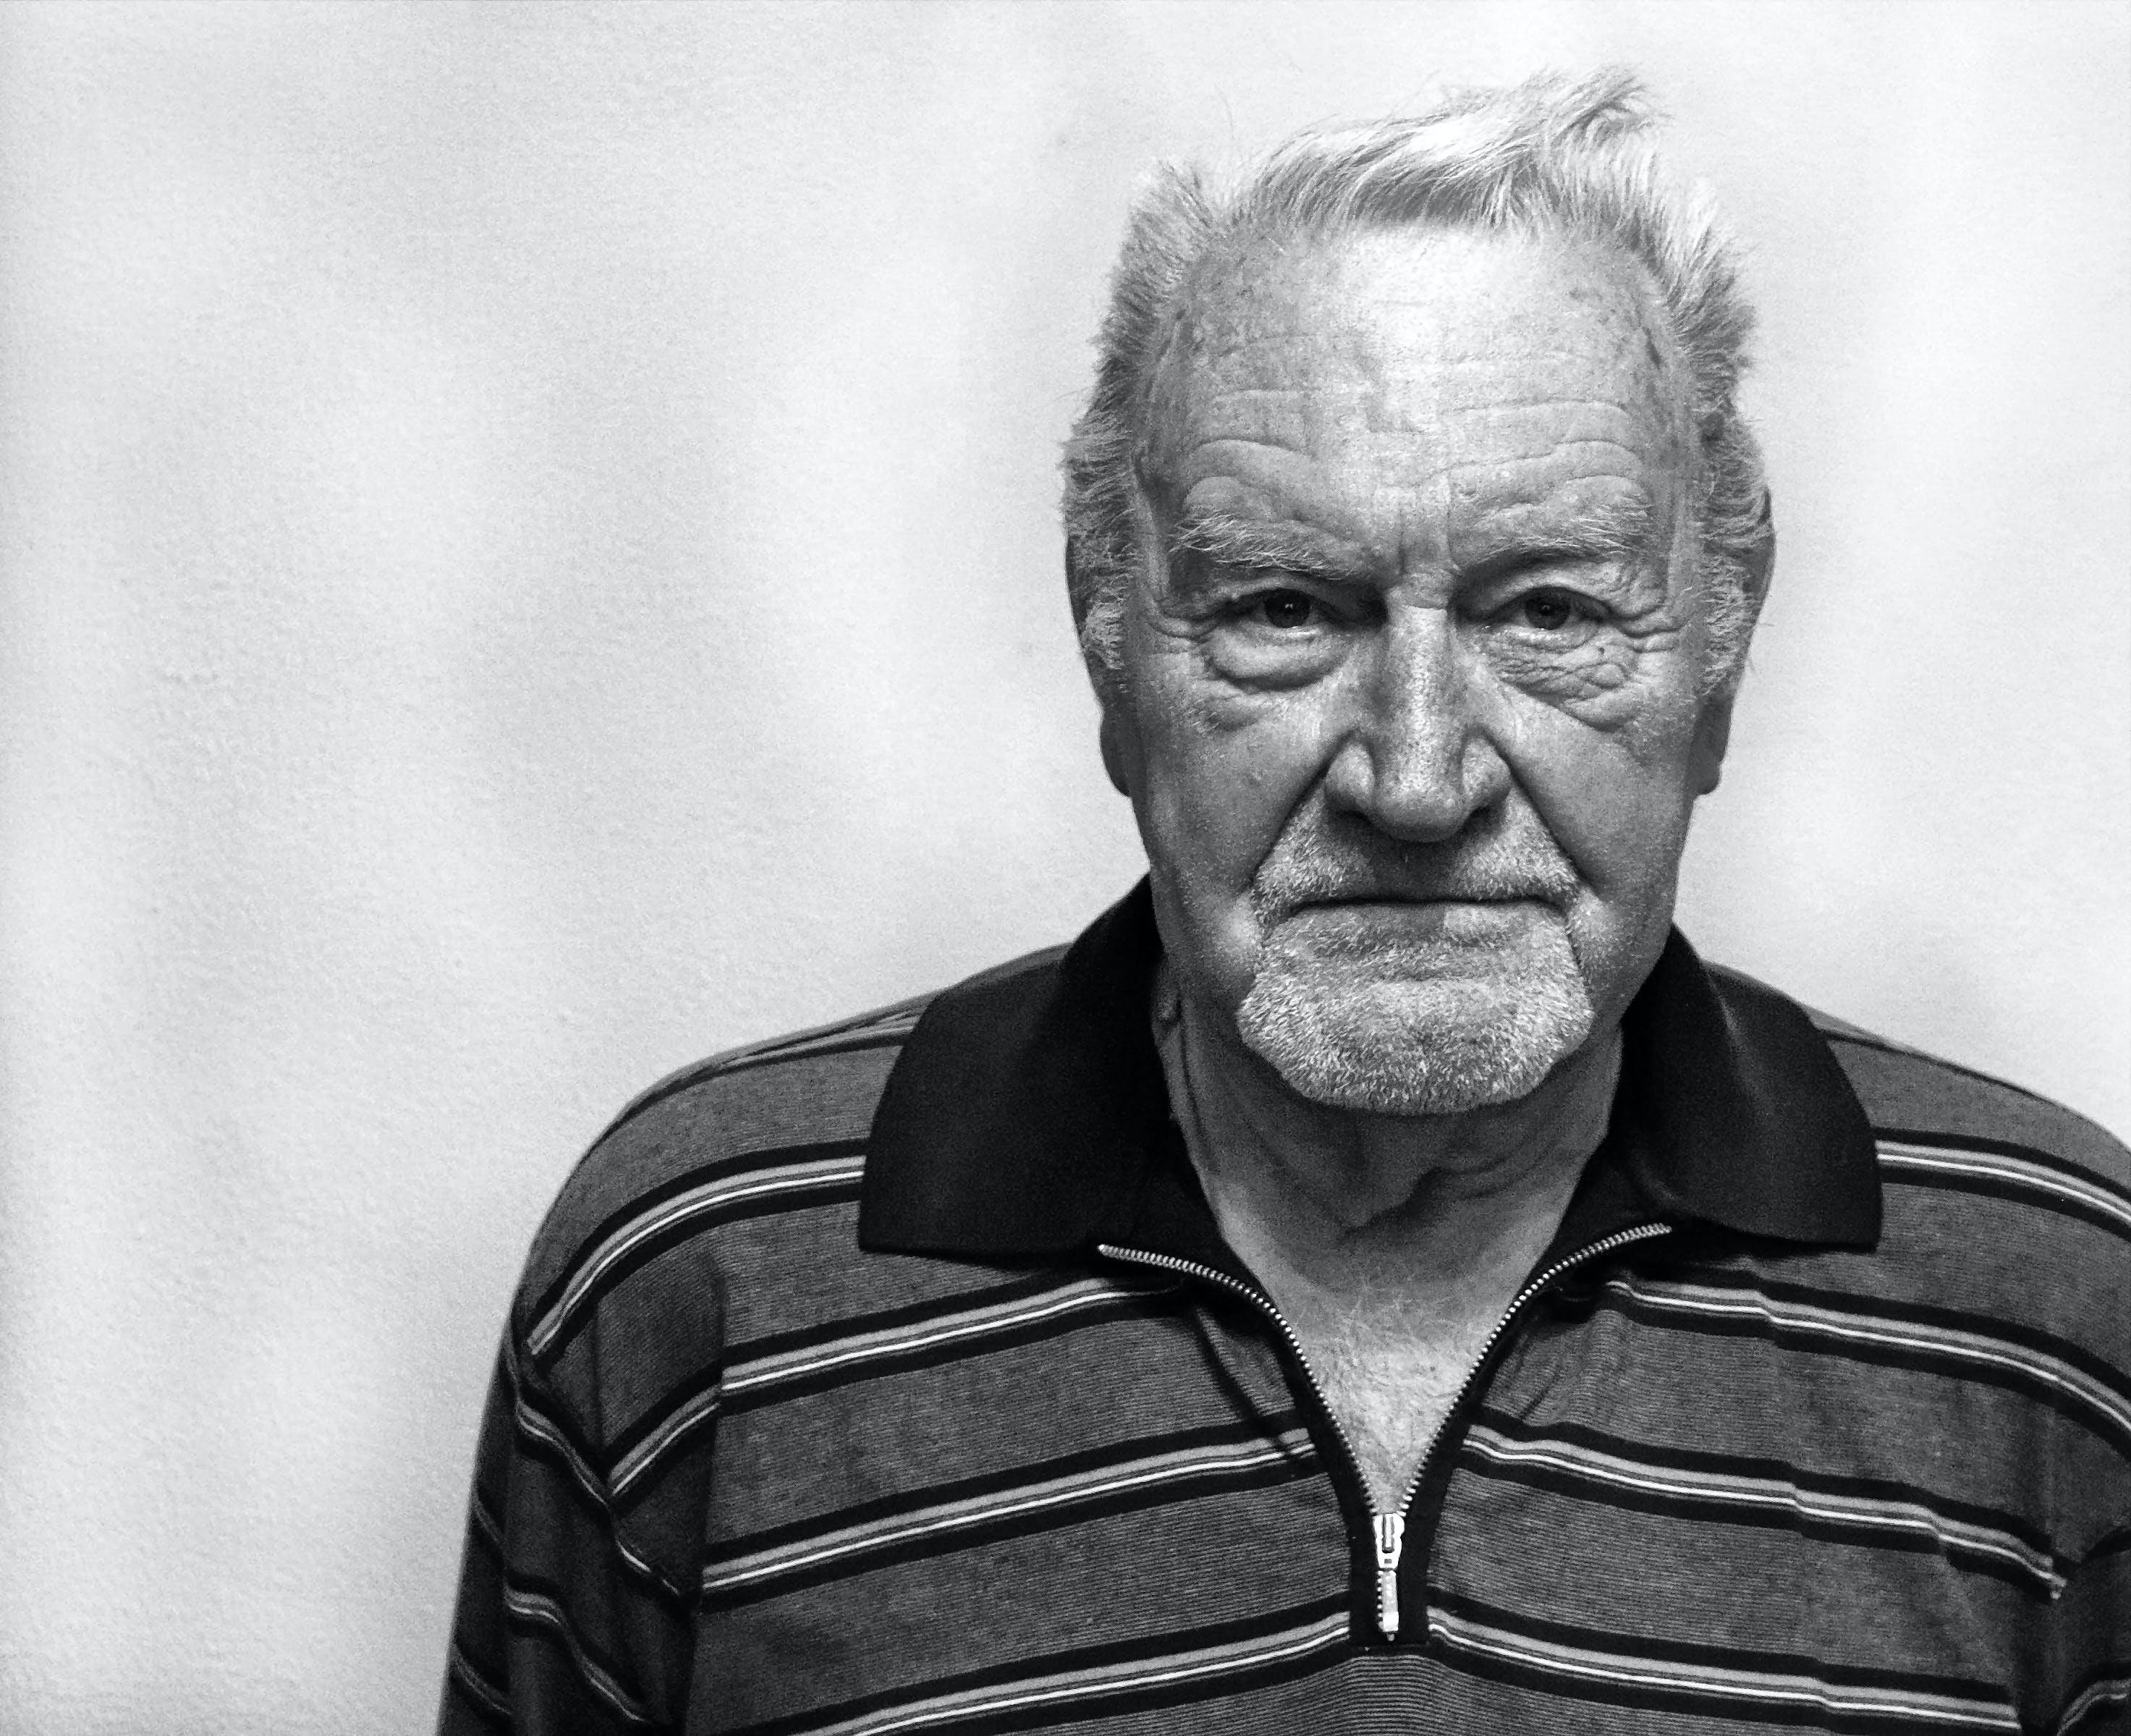 Free stock photo of man, person, grey, head